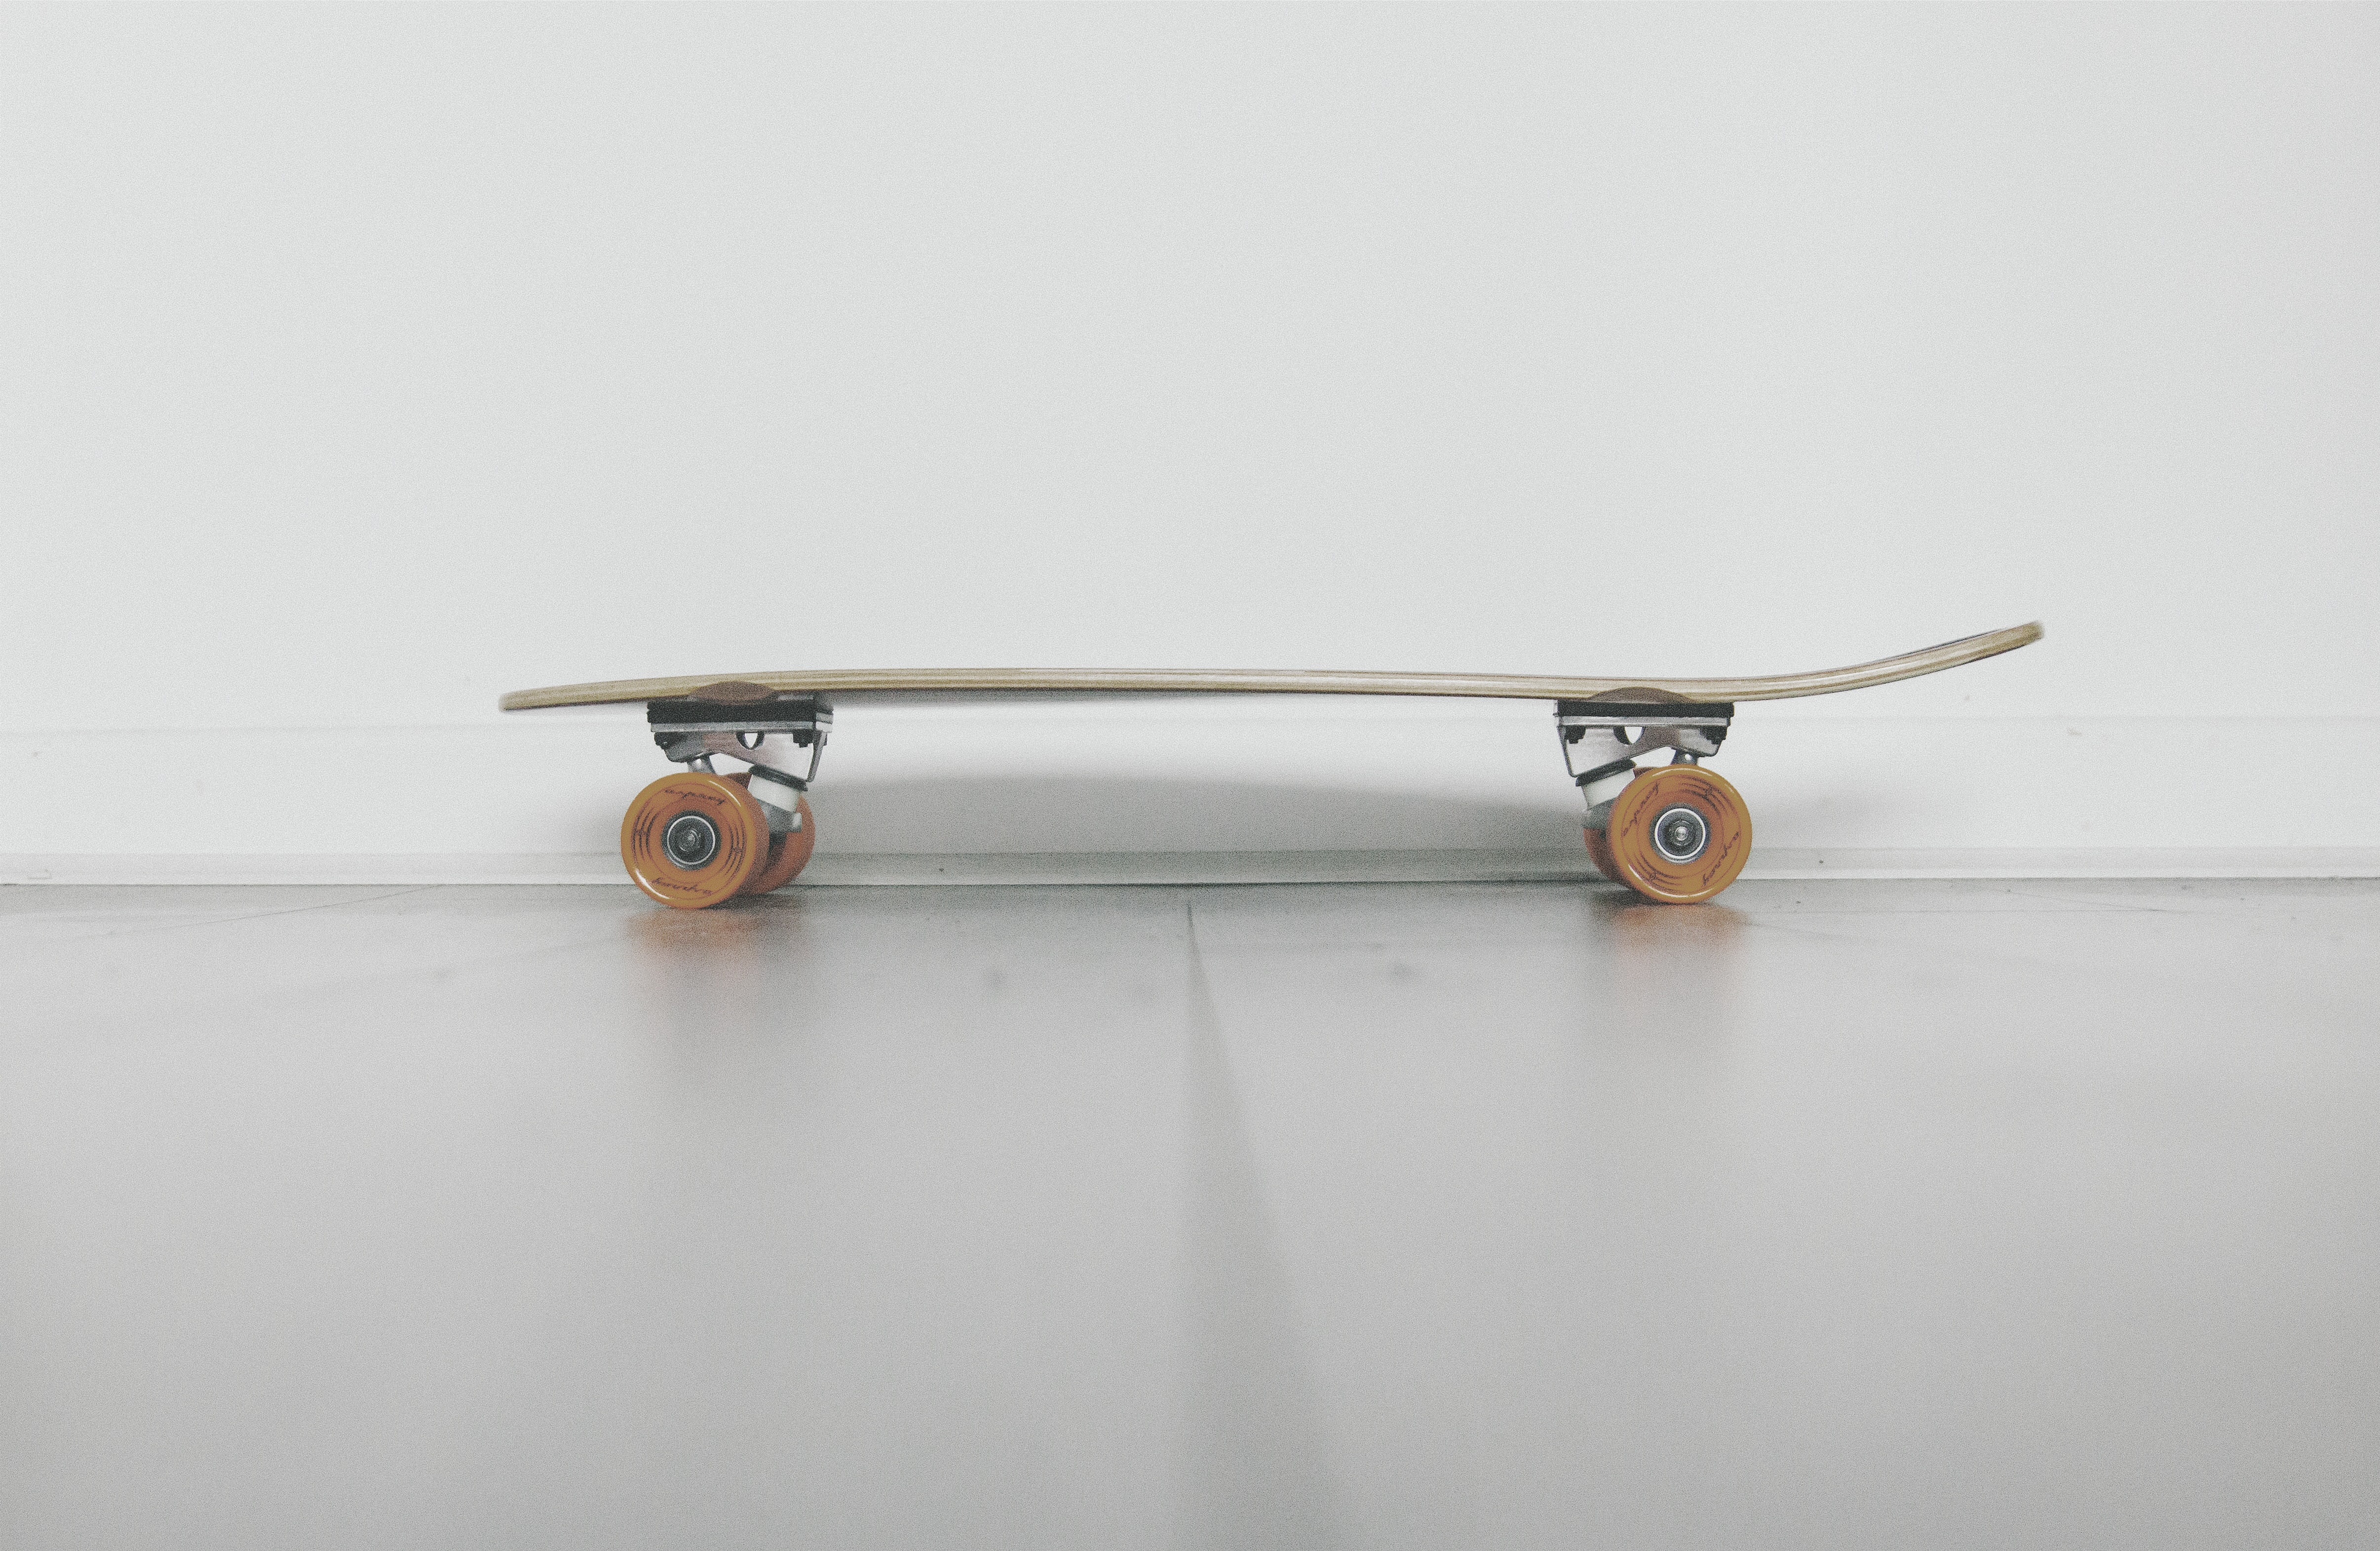 A low shot of a skateboard near a white wall